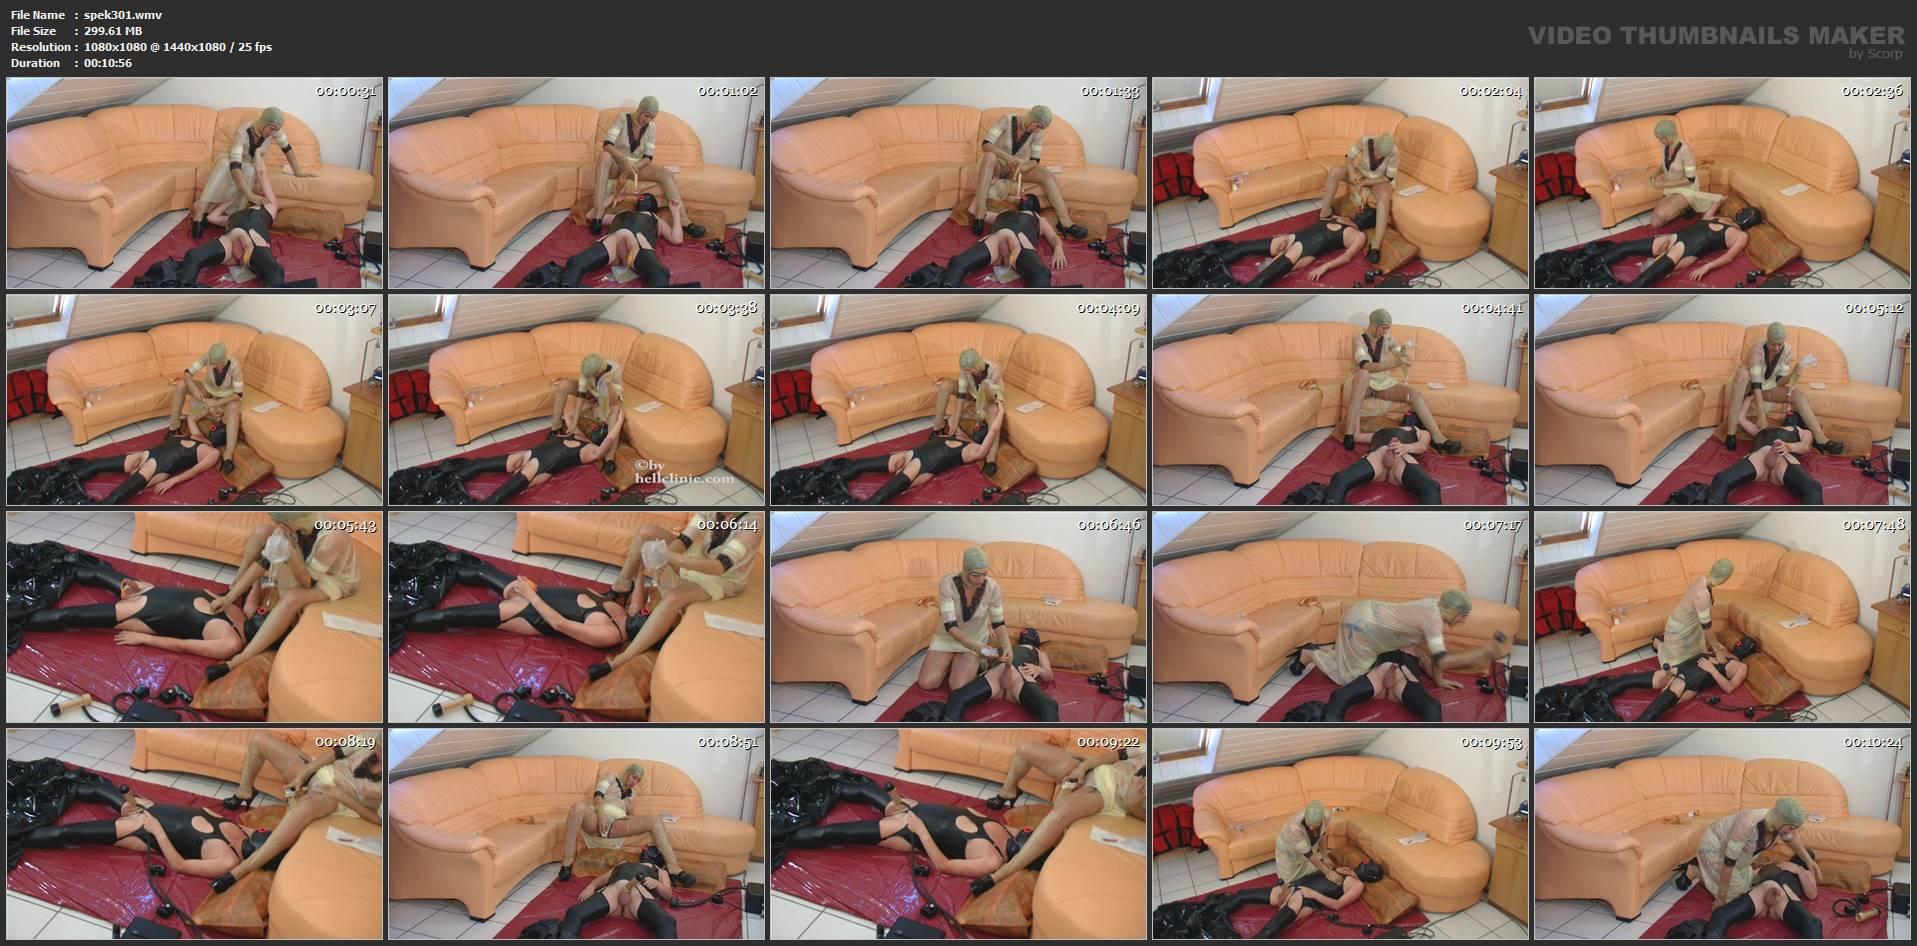 [SPEKULA] Good morning rubberweekend [FULL HD][1080p][WMV]